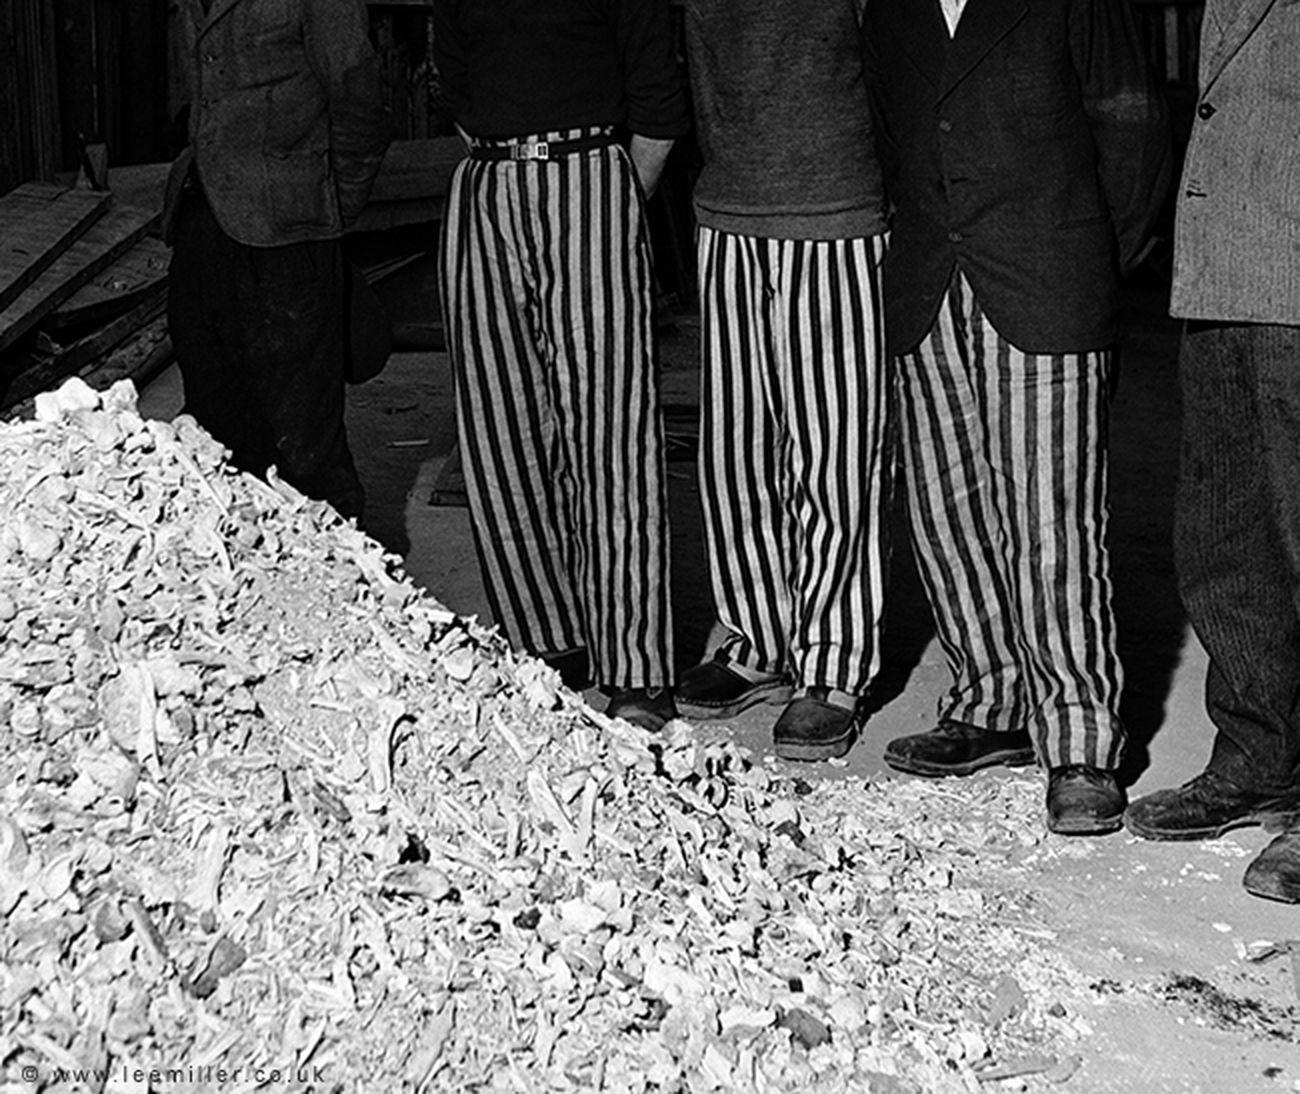 Lee Miller, Released prisoners in striped prison dress © Lee Miller Archives England 2018. All Rights Reserved. www.leemiller.co.uk